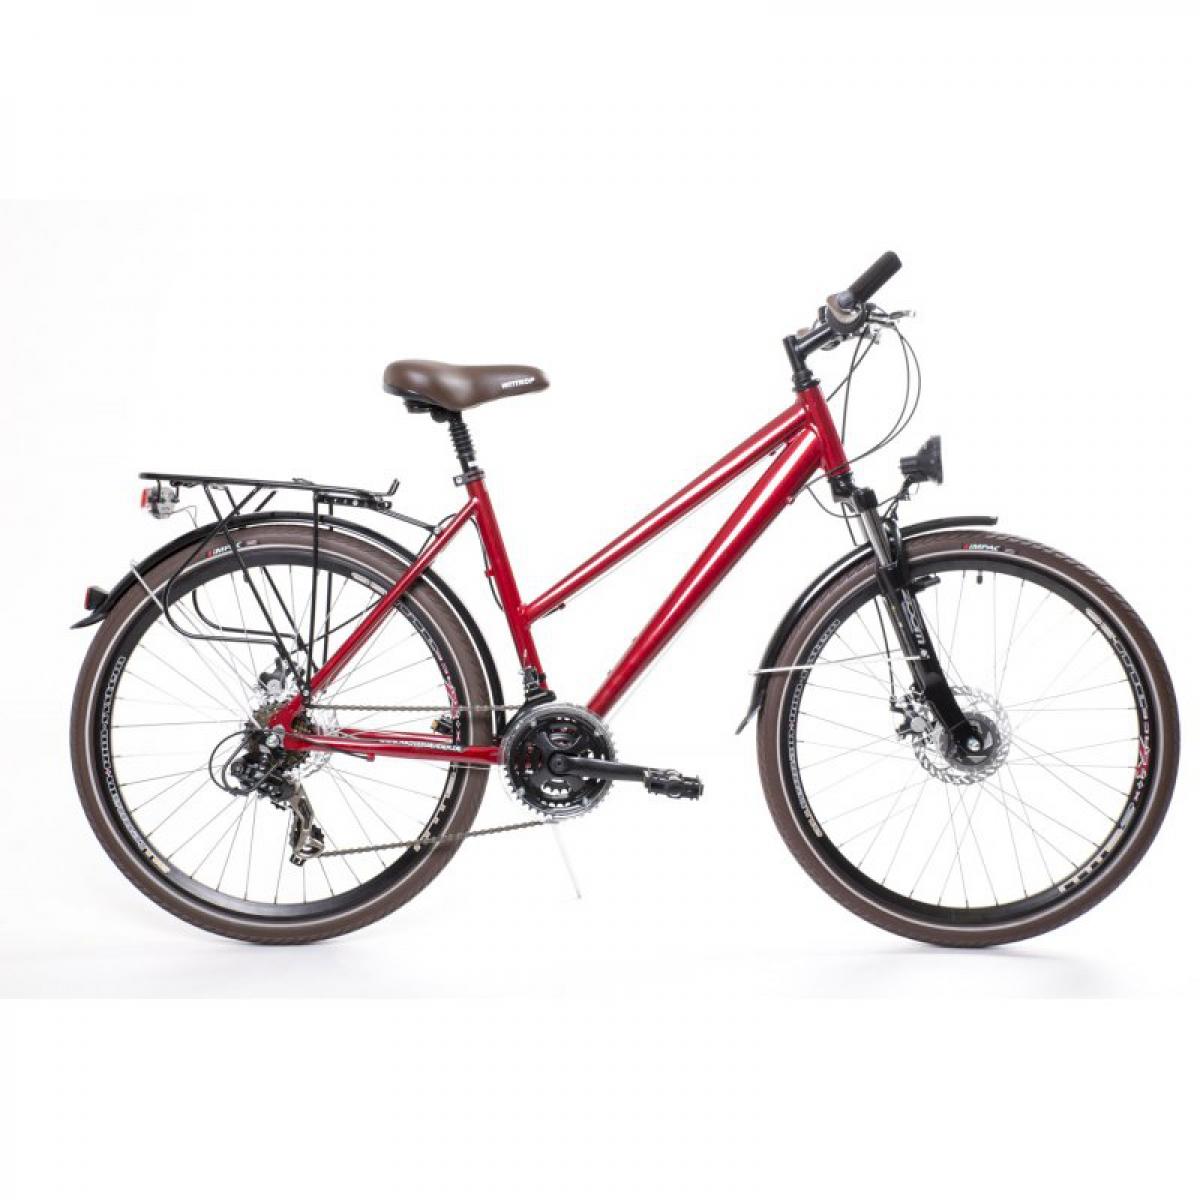 26 zoll alu trekking city fahrrad damen rad bike shimano 21 gang disc rot ebay. Black Bedroom Furniture Sets. Home Design Ideas